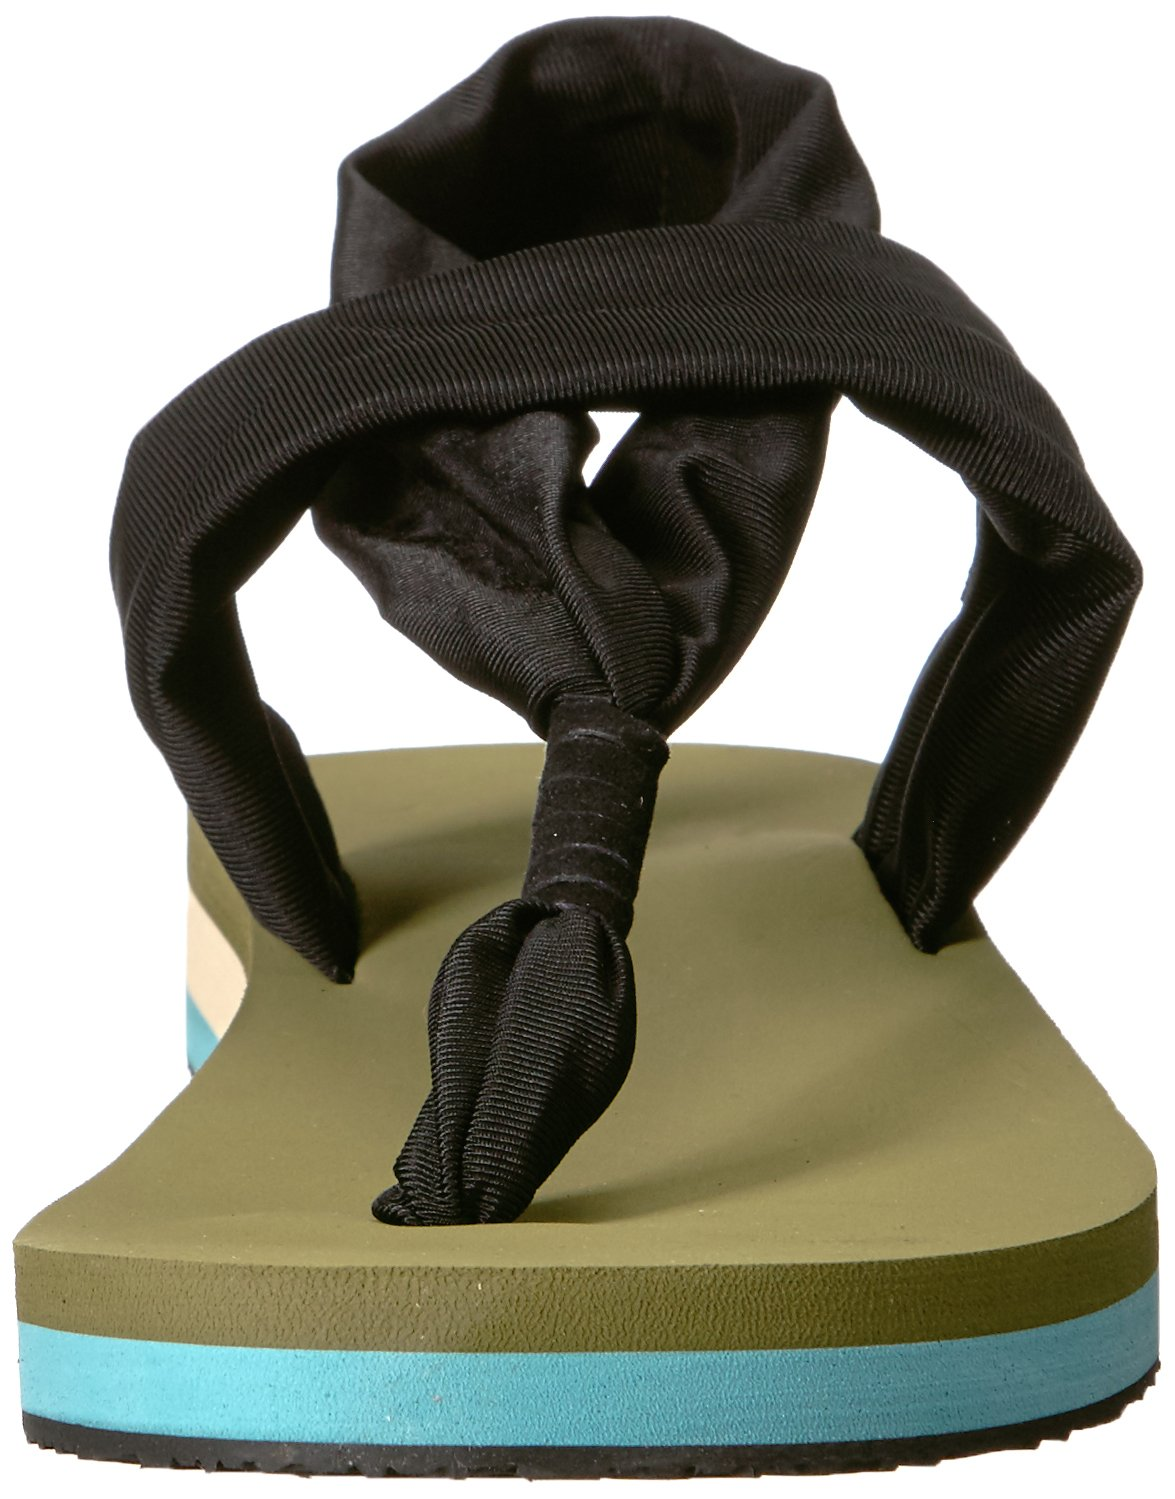 Chooka Women's Yoga Mat Footbed Sling Sport Sandal Flip-Flop B074NZV8JW 9 M US Olive